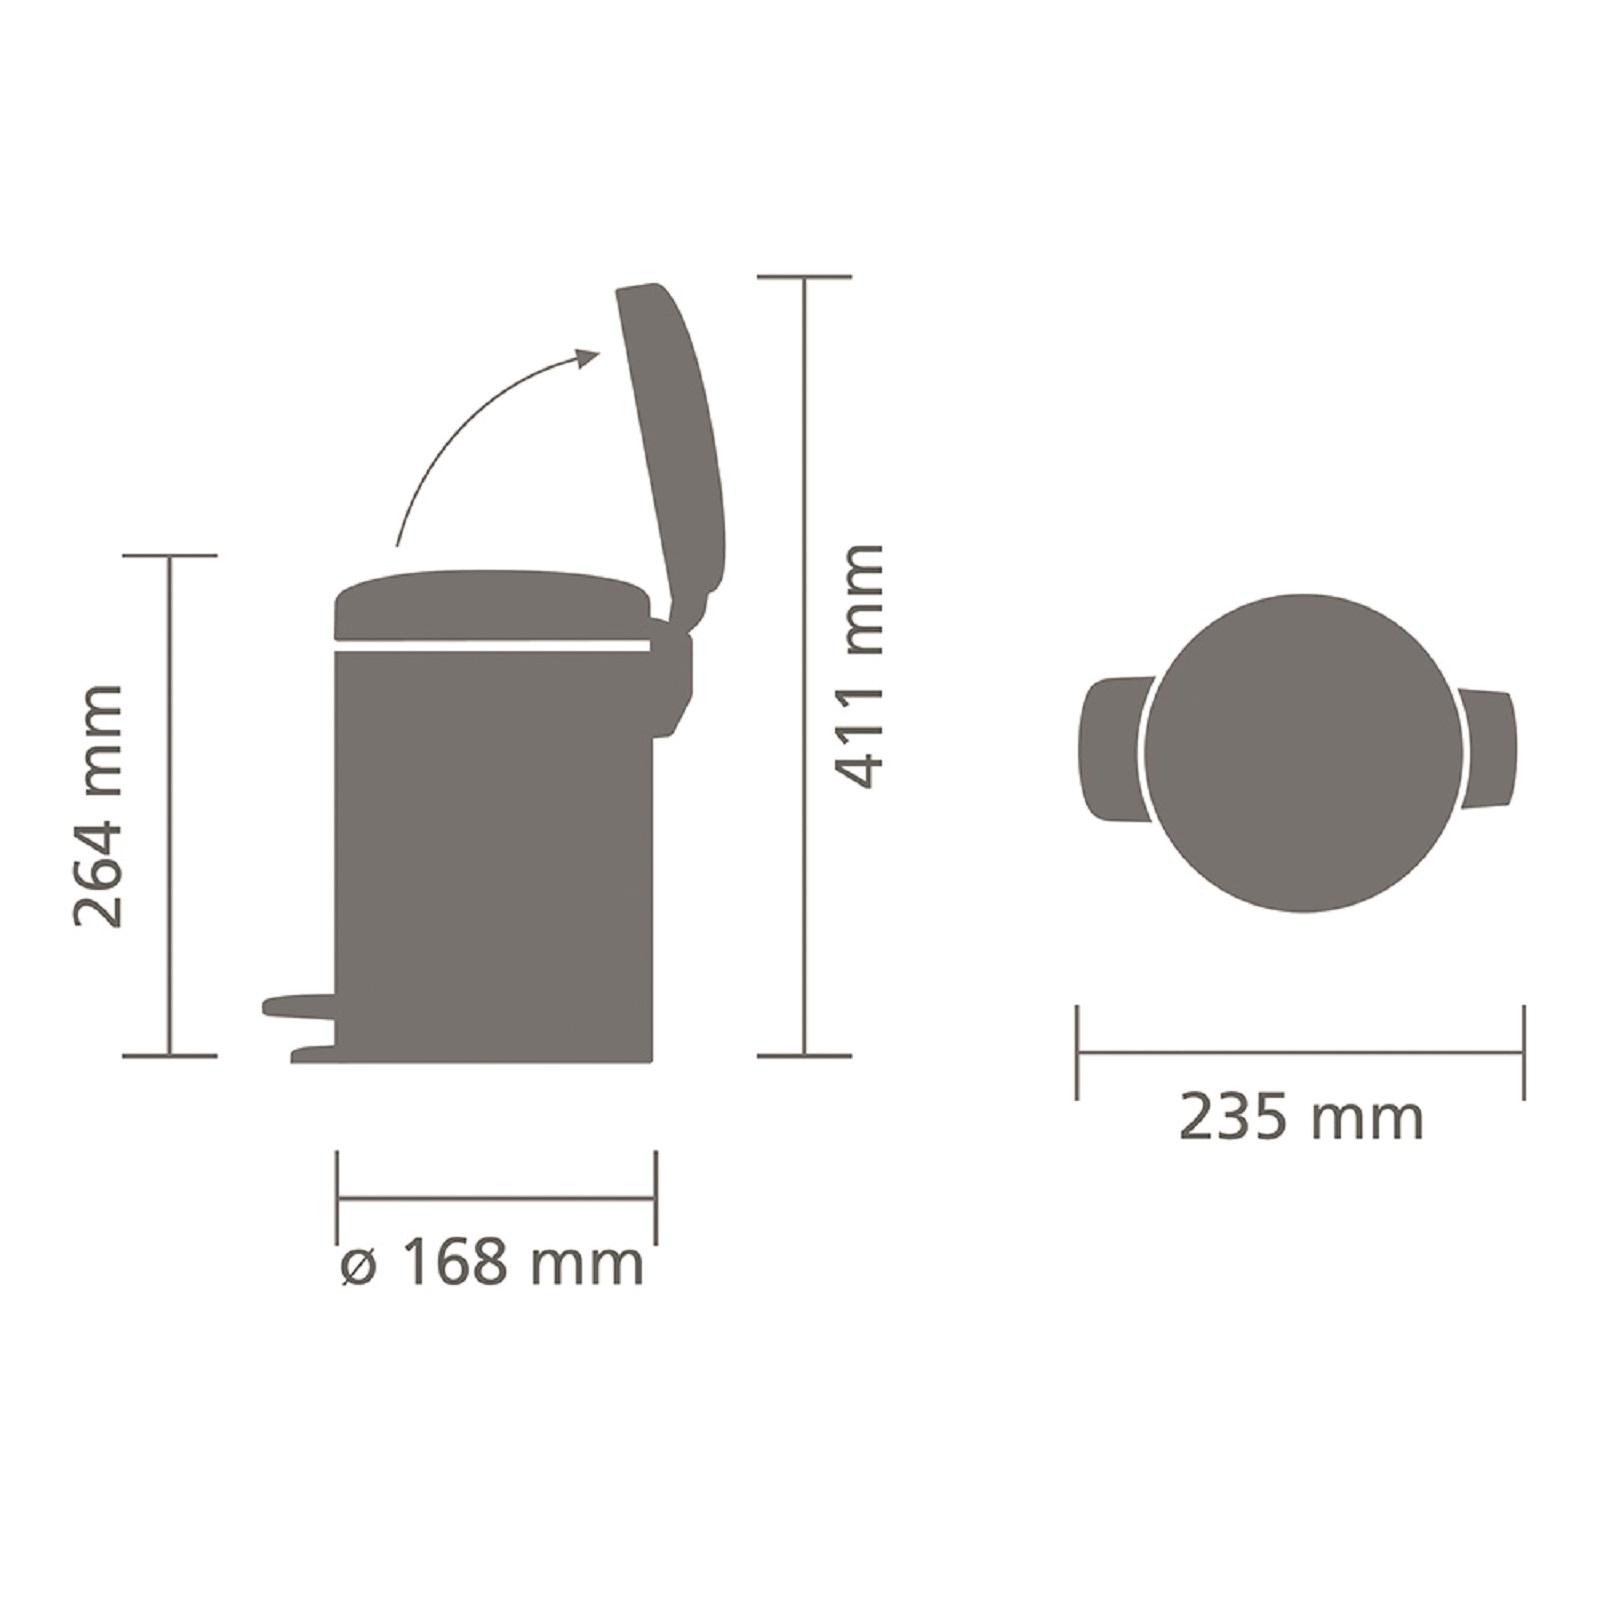 Бак для мусора Pedal Bin NewIcon Brabantia, объем 3 л, шампань бежевый Brabantia 304408 фото 8